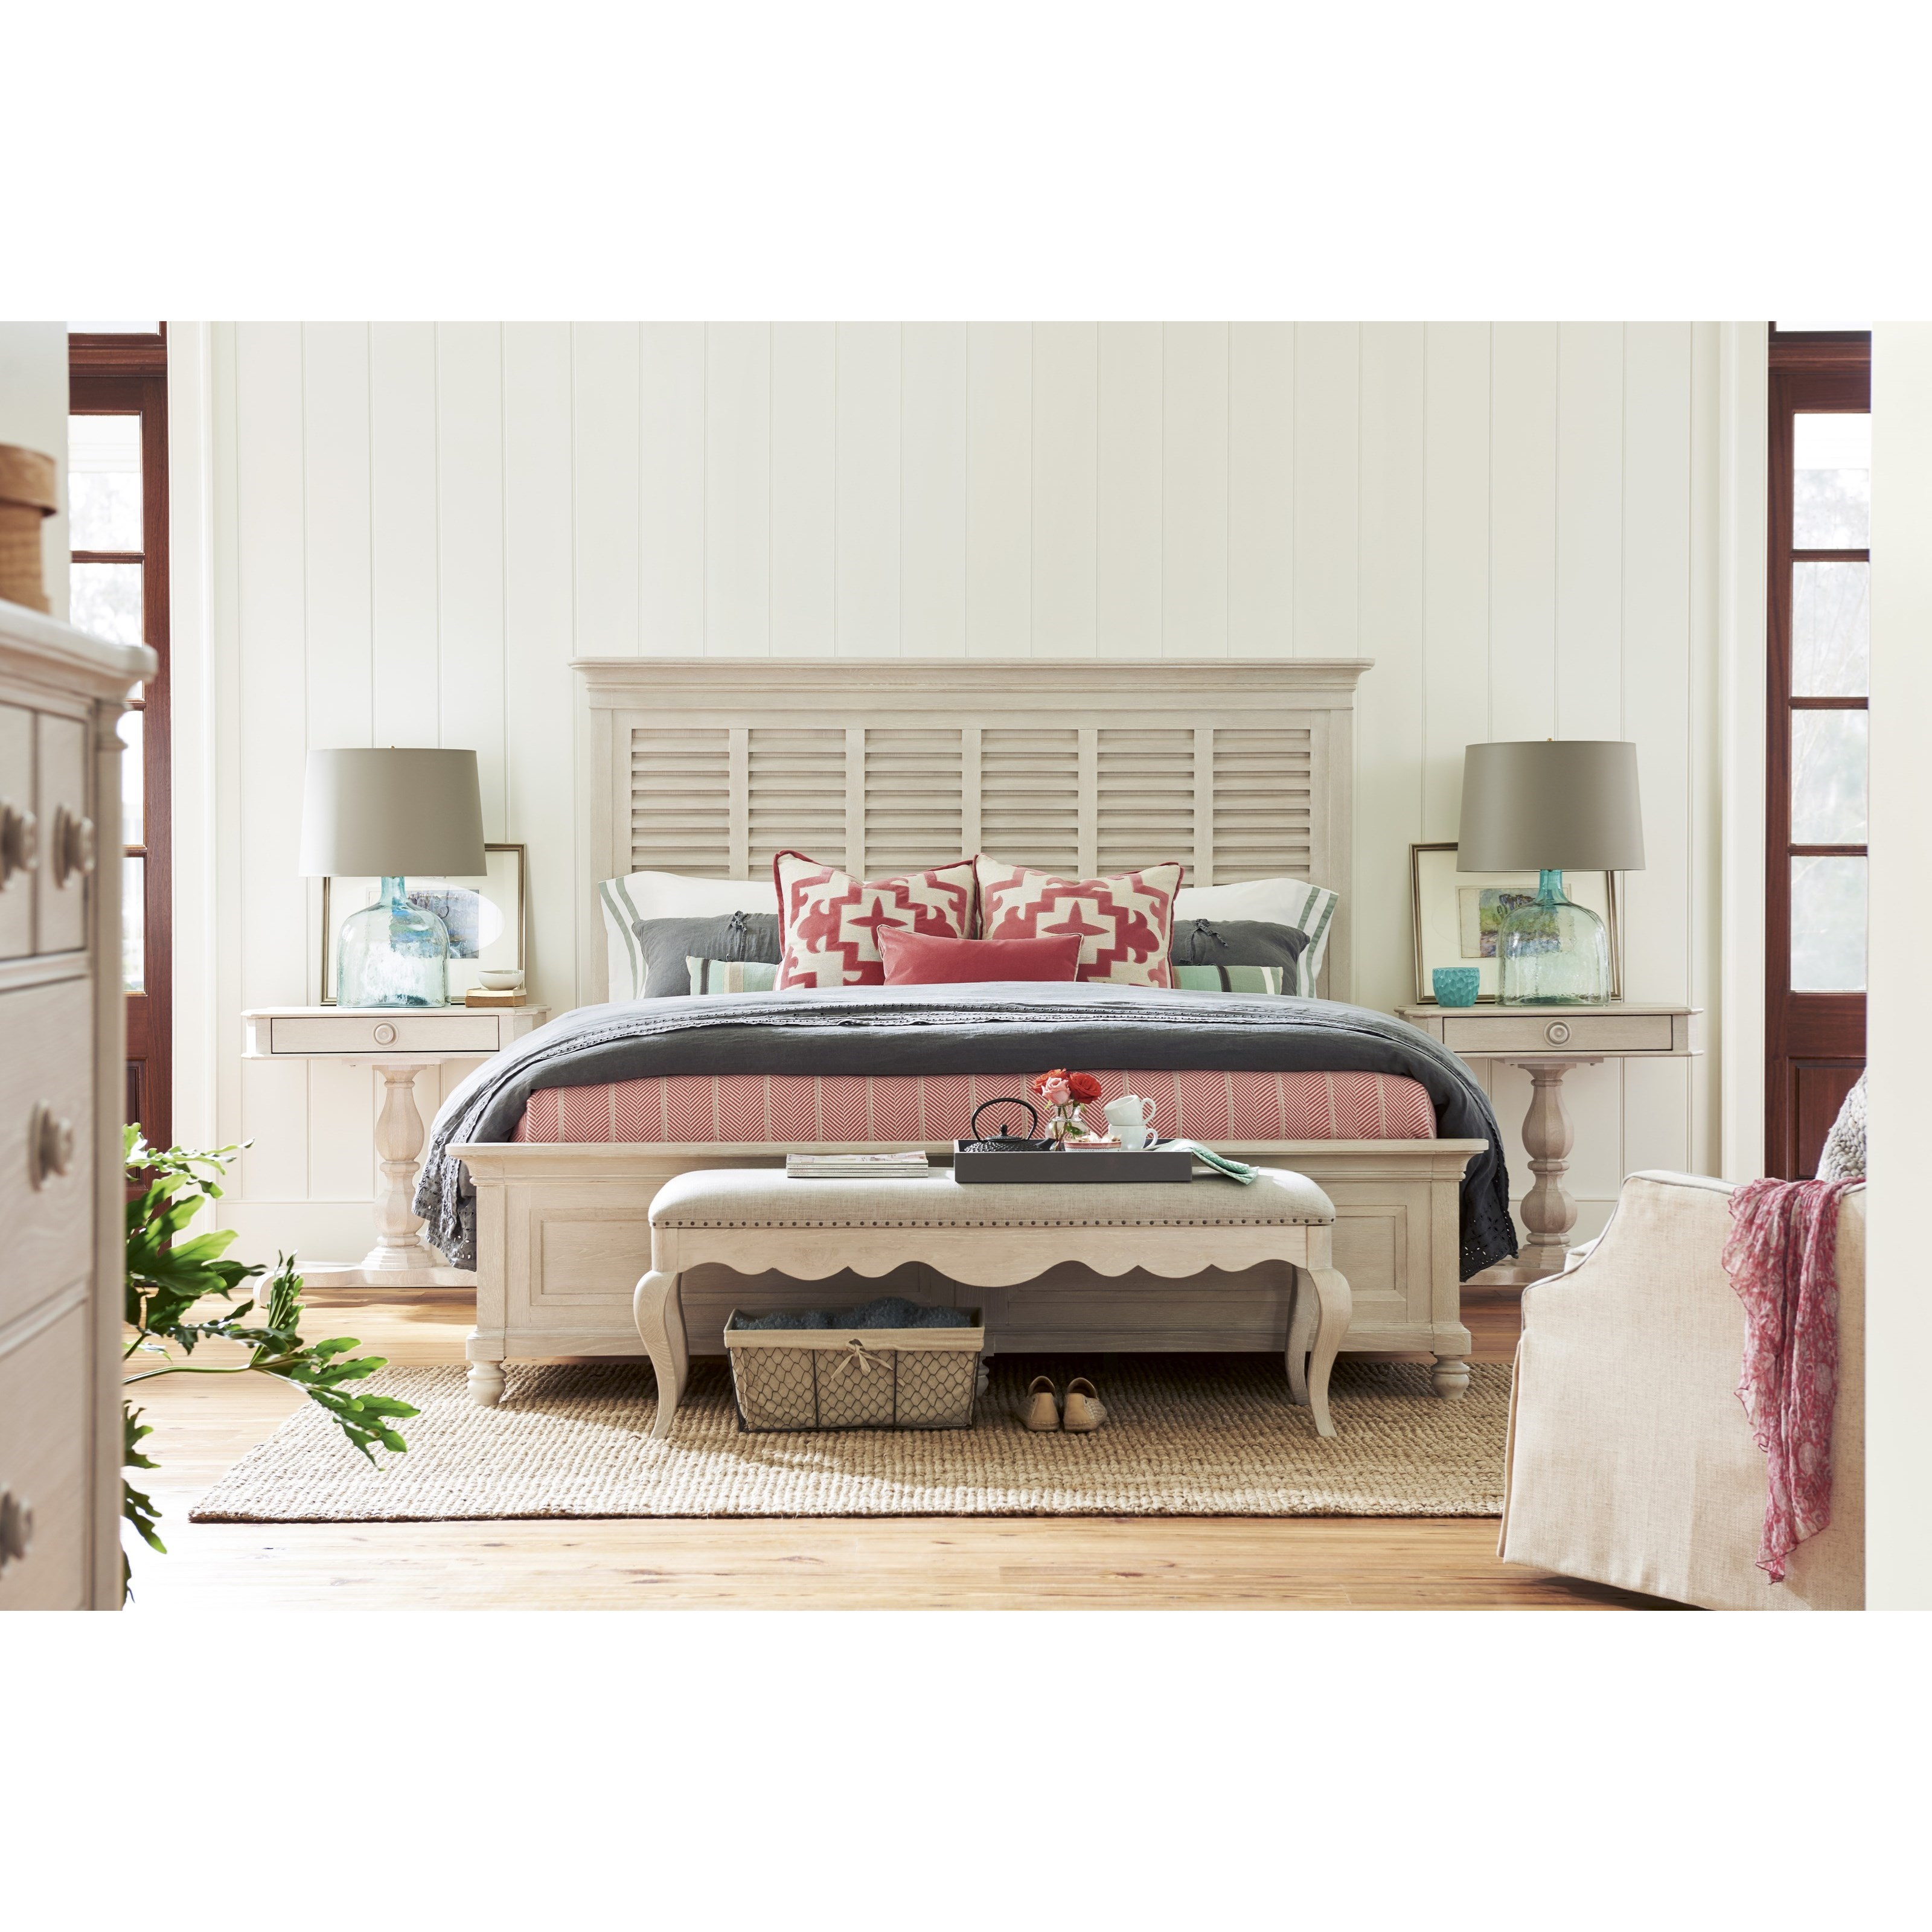 Paula Deen By Universal Bungalow Cottage King Bedroom Group Baer 39 S Furniture Bedroom Groups